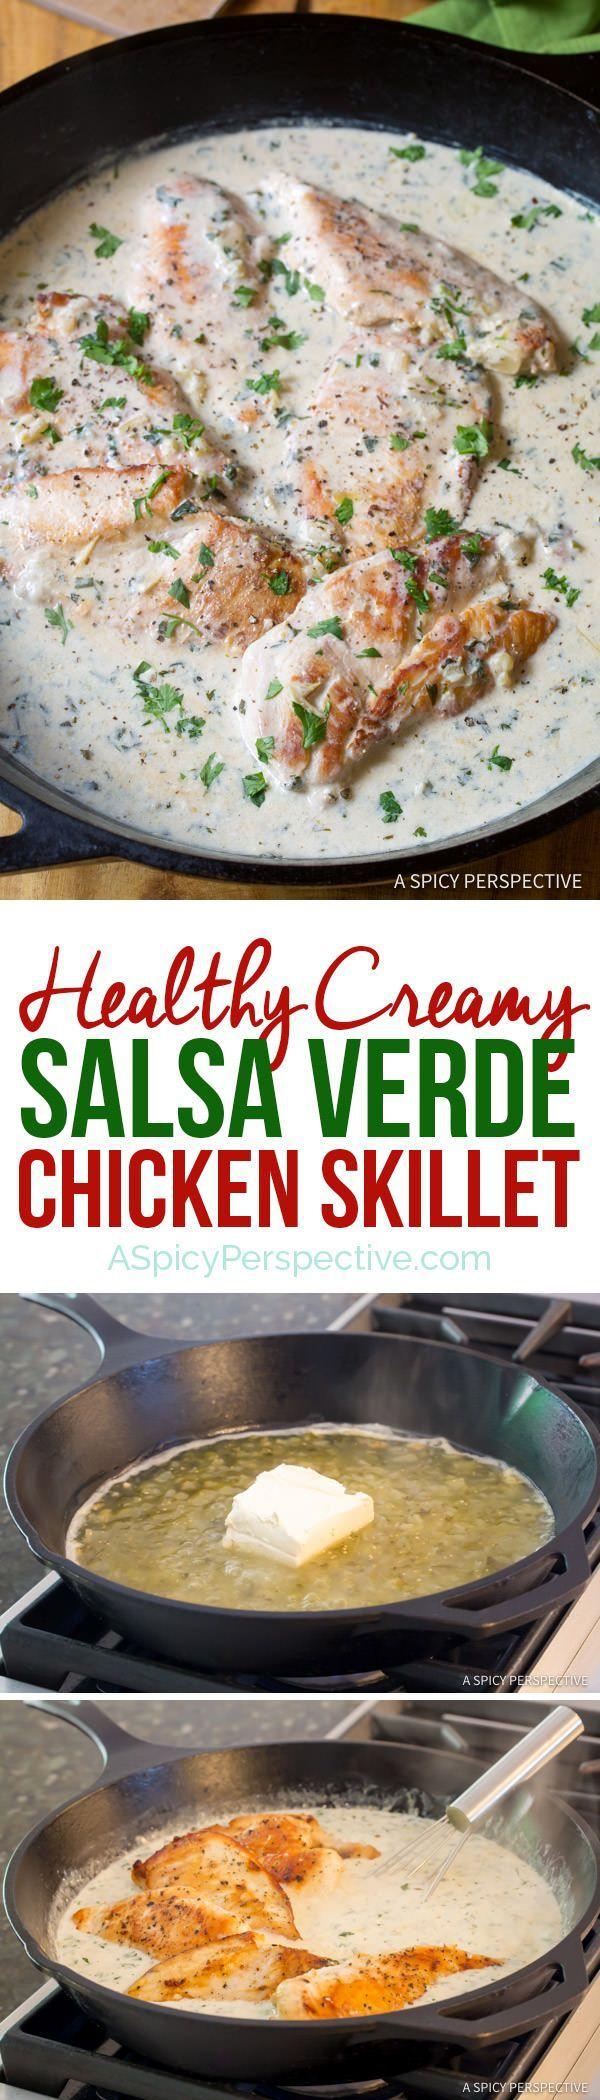 Crazy over this Healthy Creamy Salsa Verde Chicken Skillet Recipe | ASpicyPerspective.com